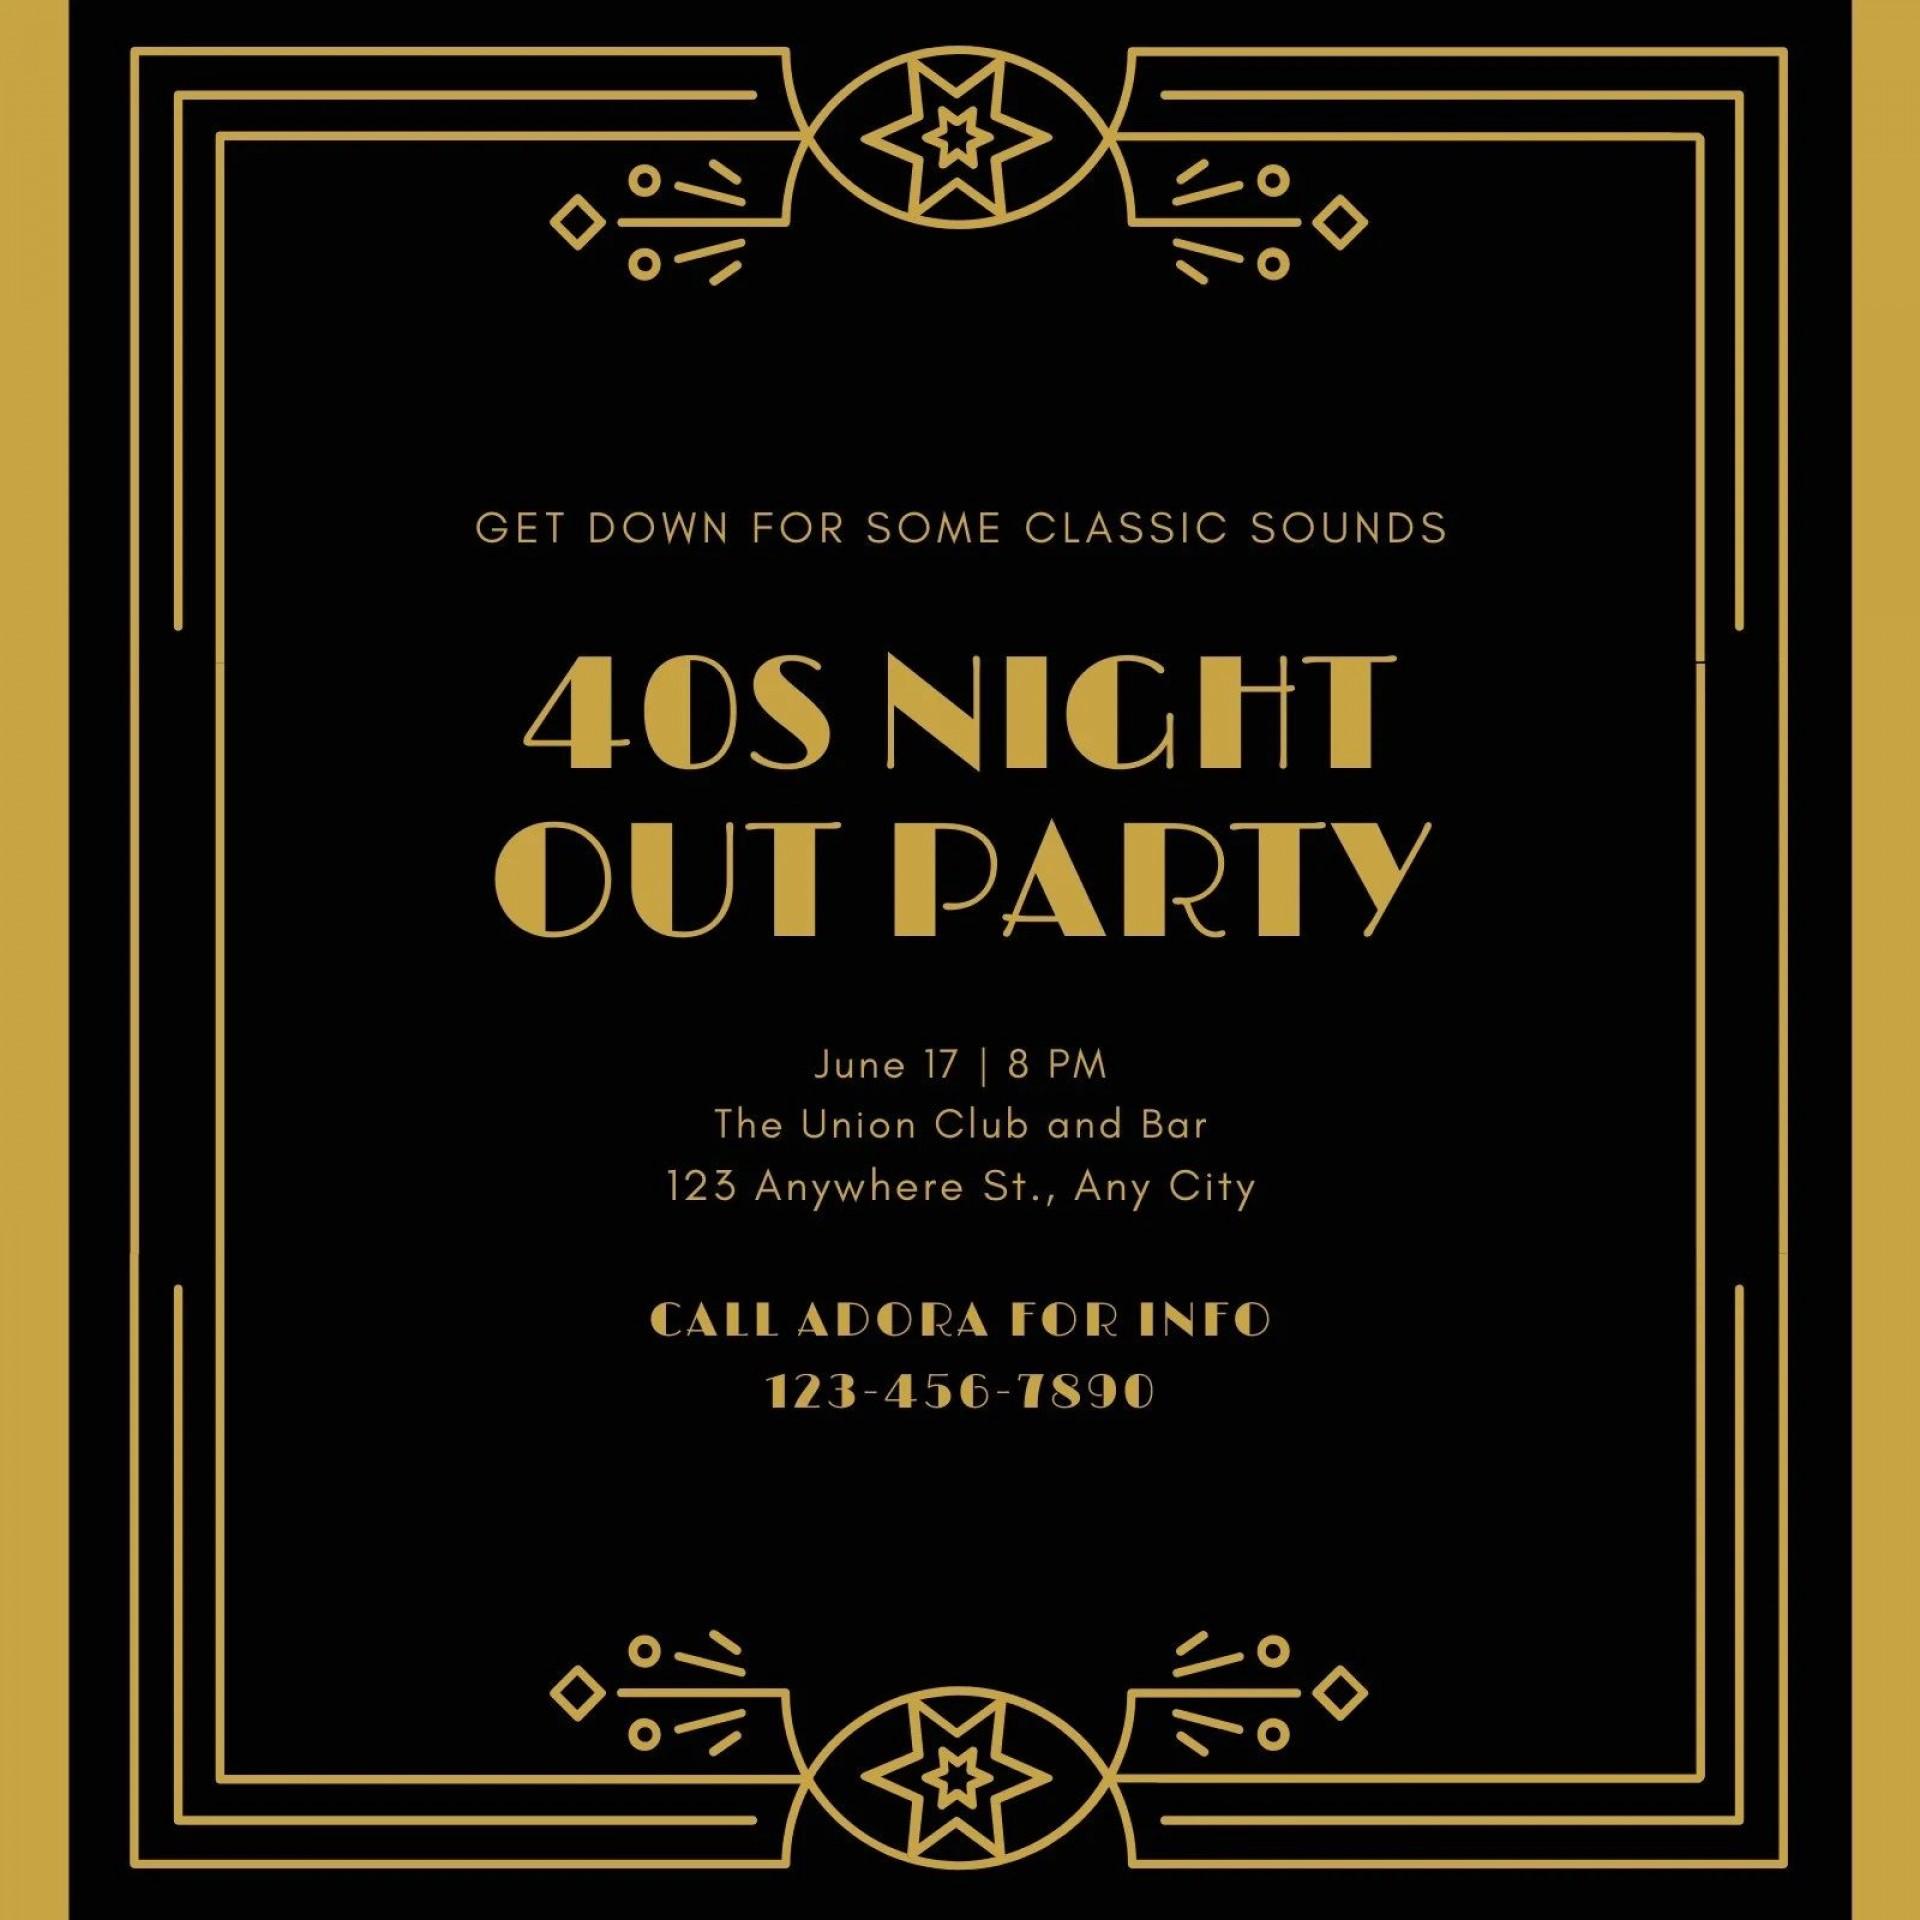 004 Sensational Great Gatsby Invitation Template Inspiration  Templates Free Download Blank1920